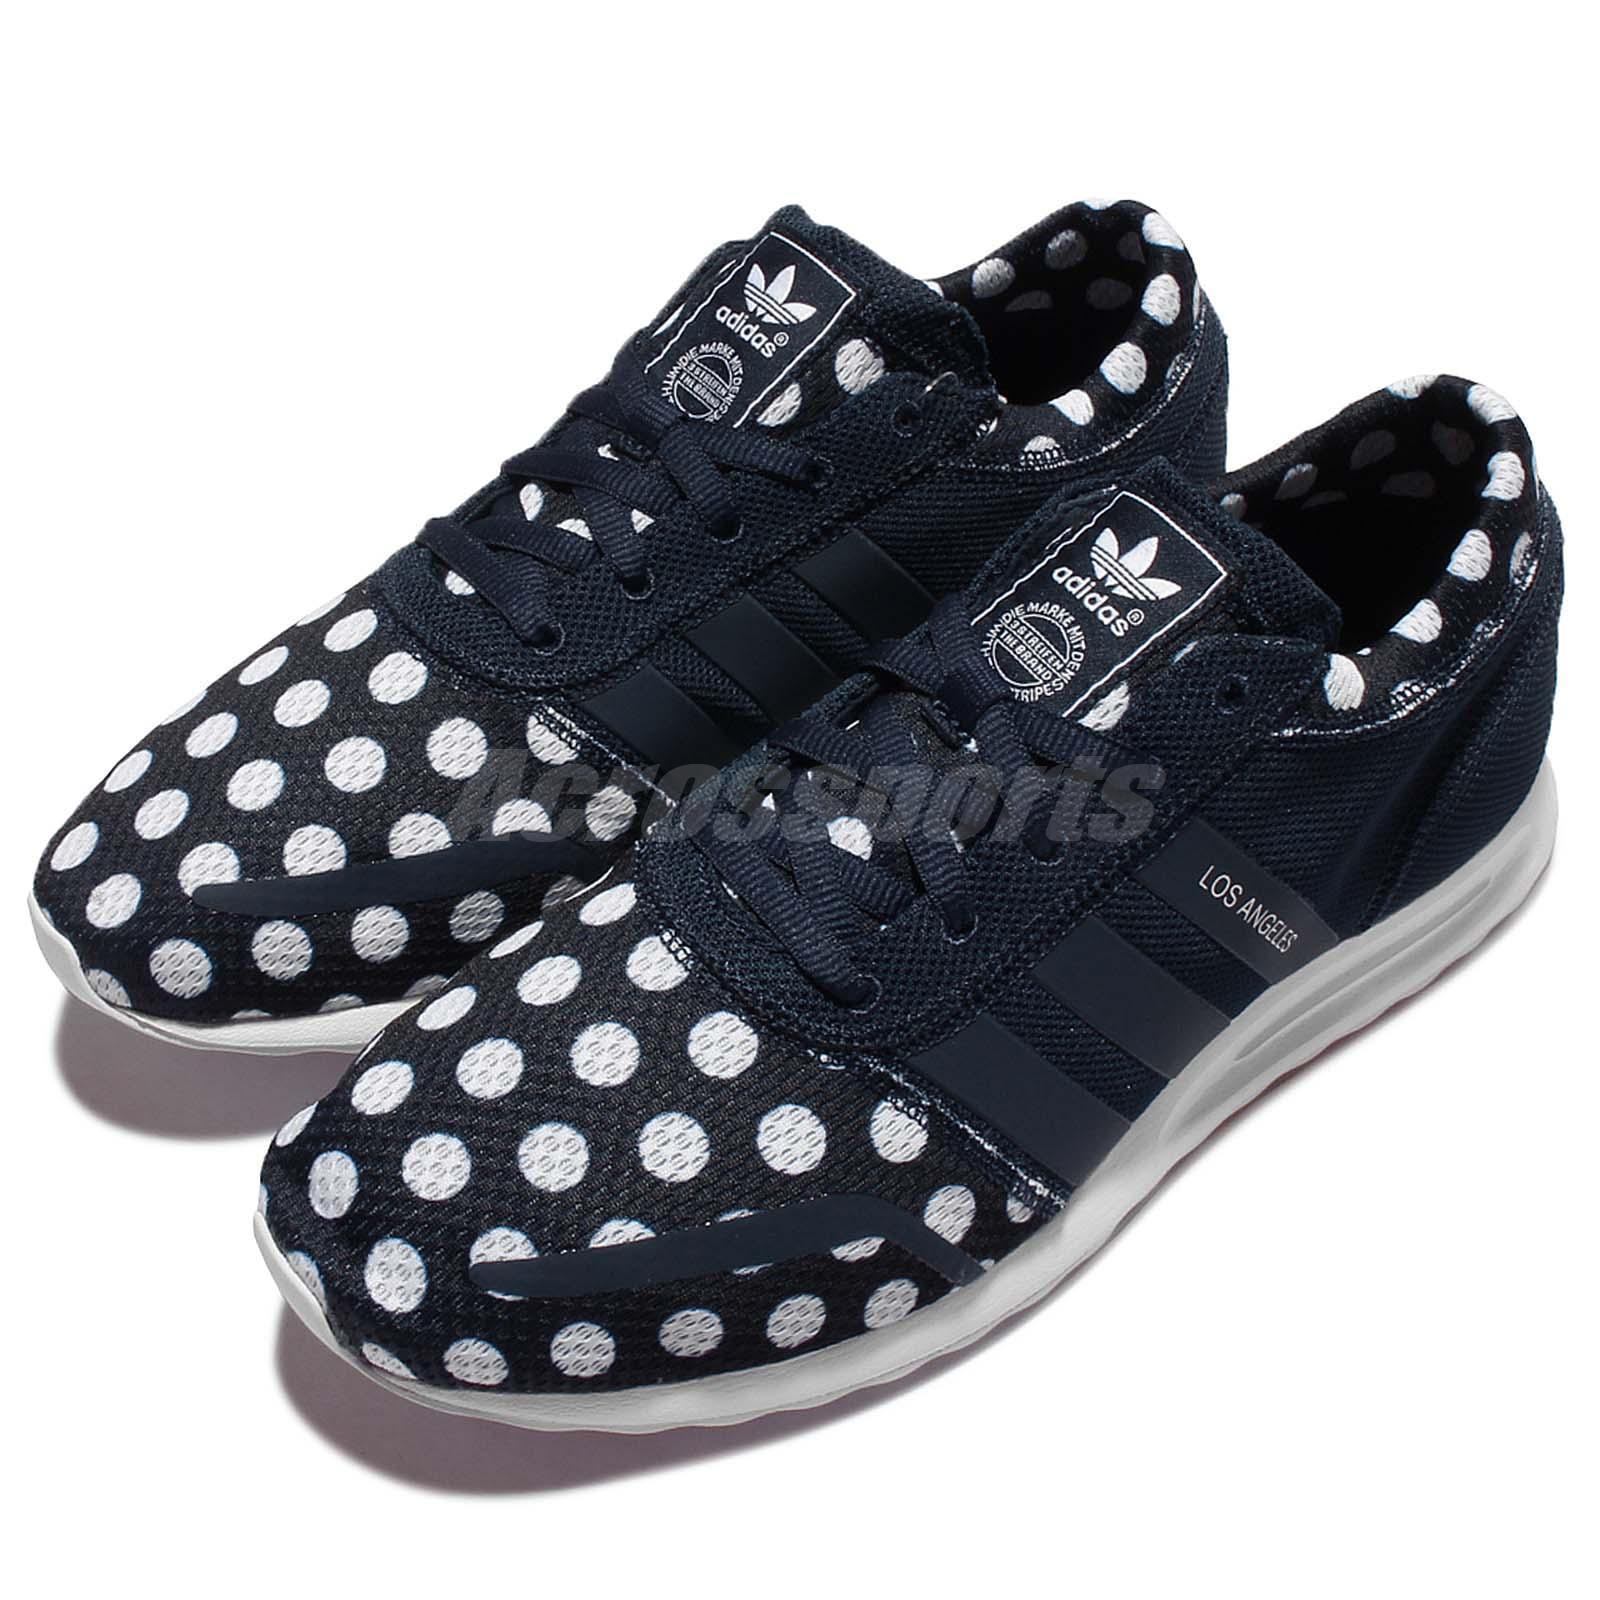 db3868a44b0 Details about adidas Originals Los Angeles Navy White Polka Dot Men Casual  Shoe Sneaker AQ4544